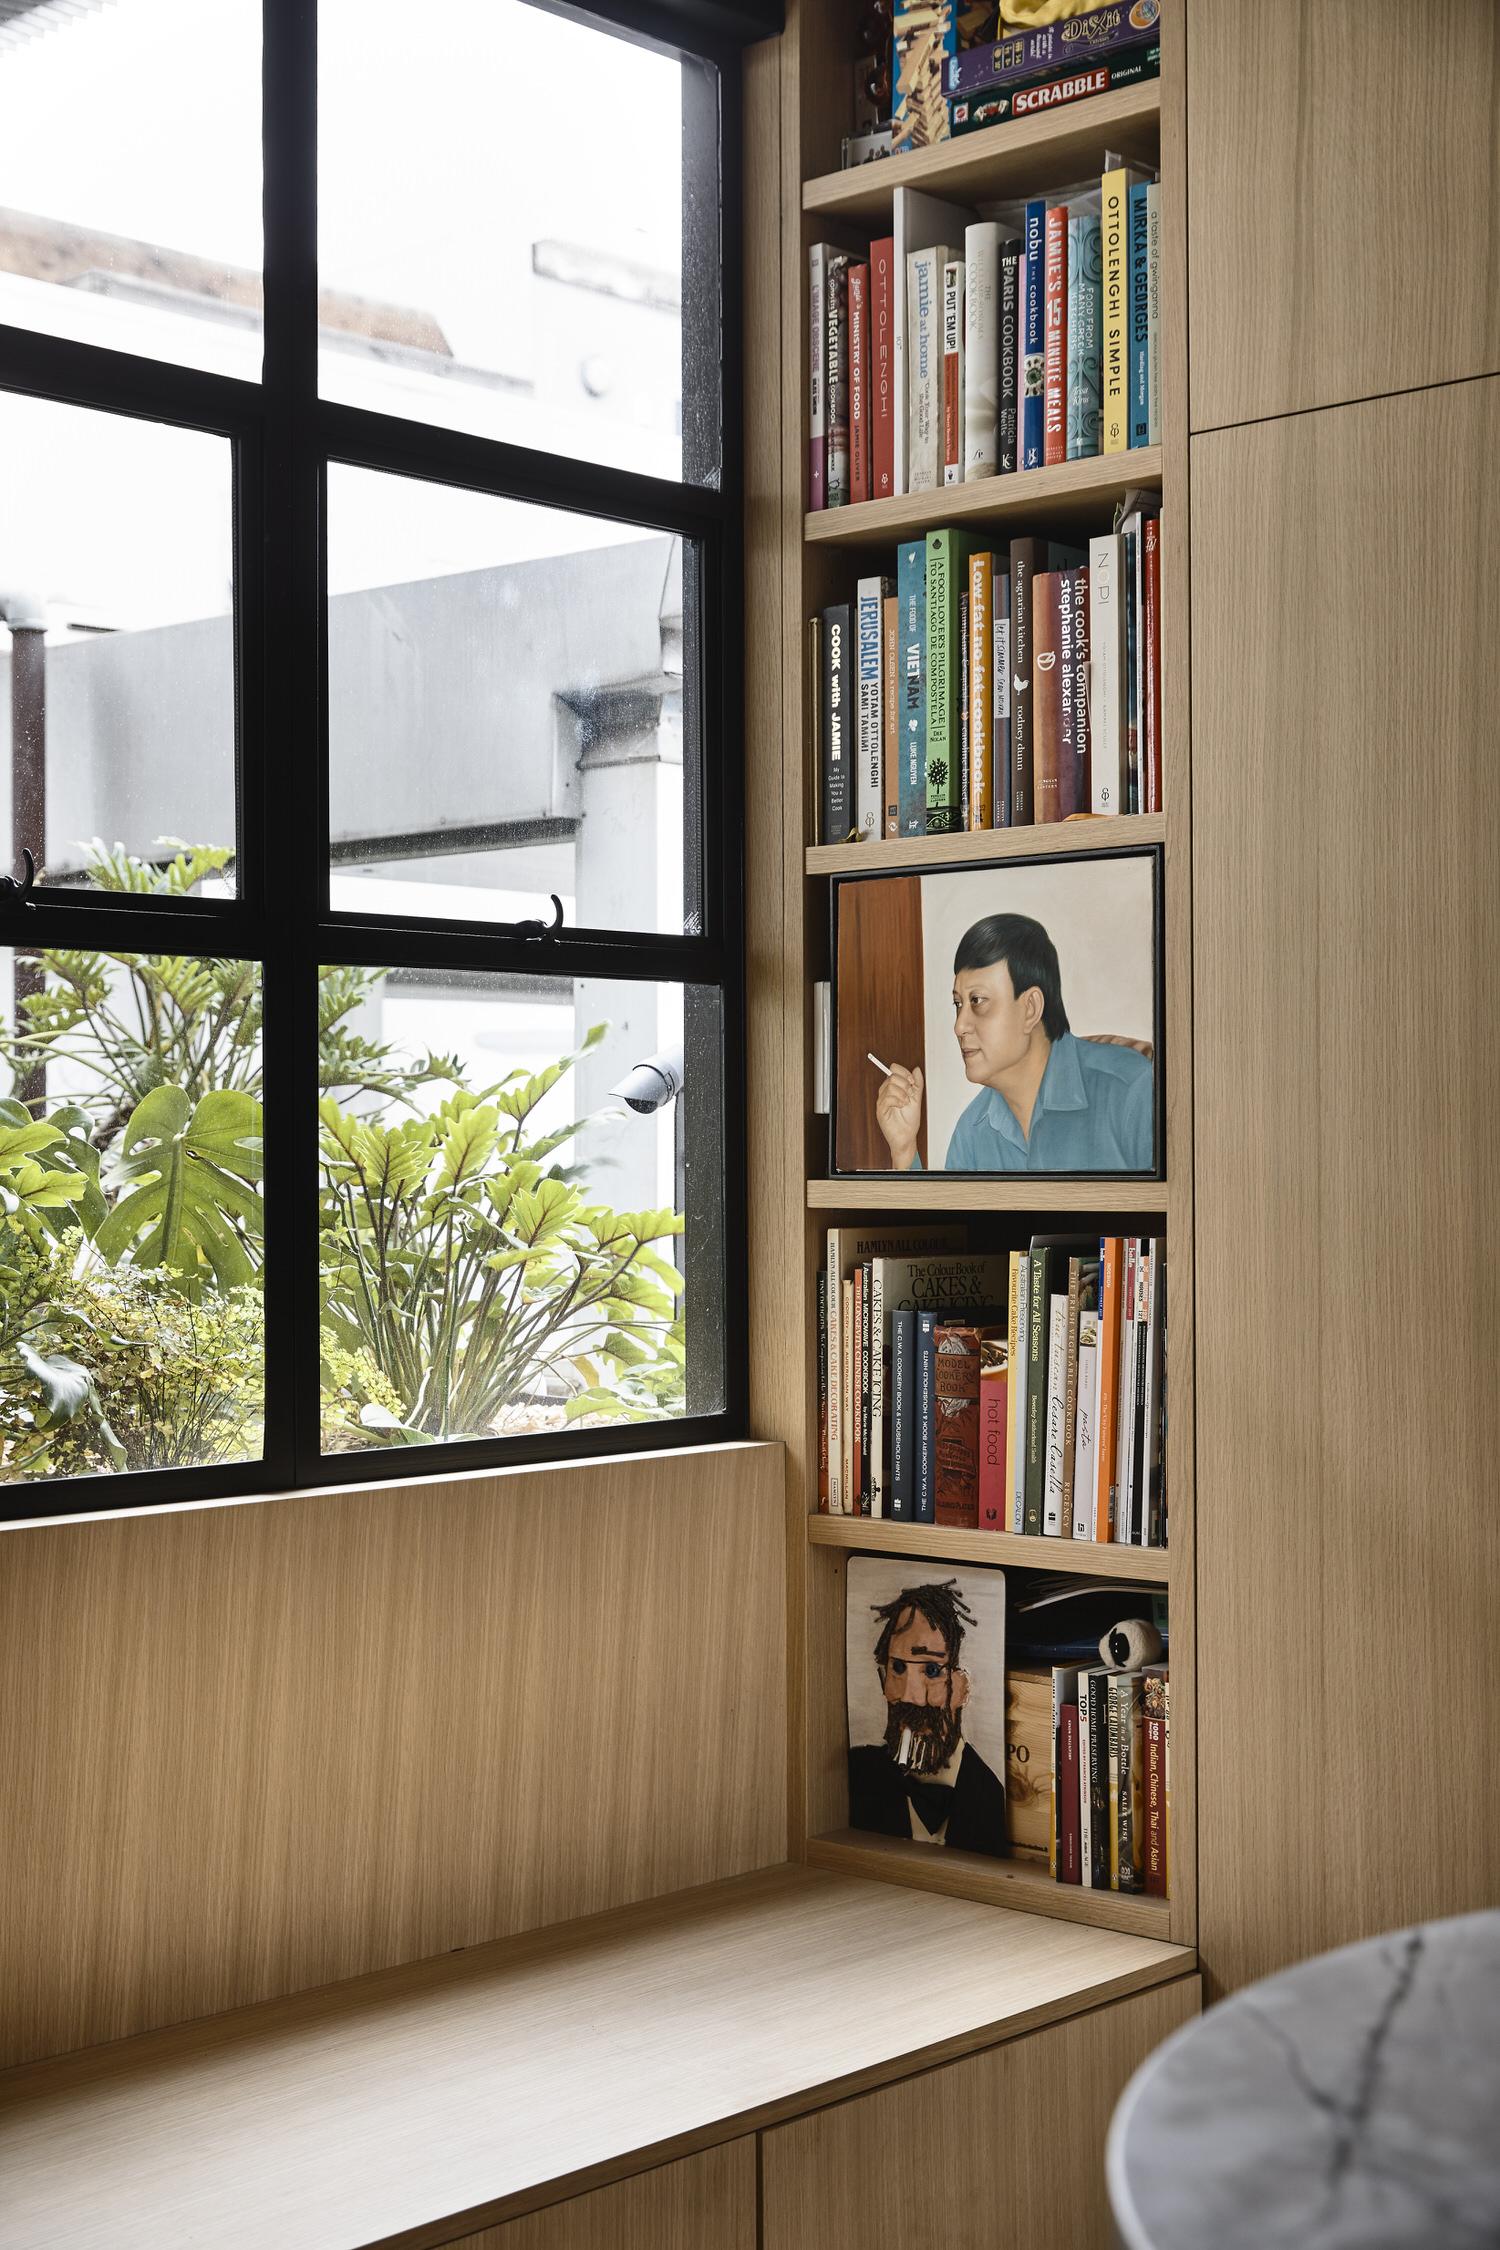 Collingwood Warehouse Apartment Refurbishment, Rob Kennon, Australian Architecture, Photo Derek Swalwell   Yellowtrace